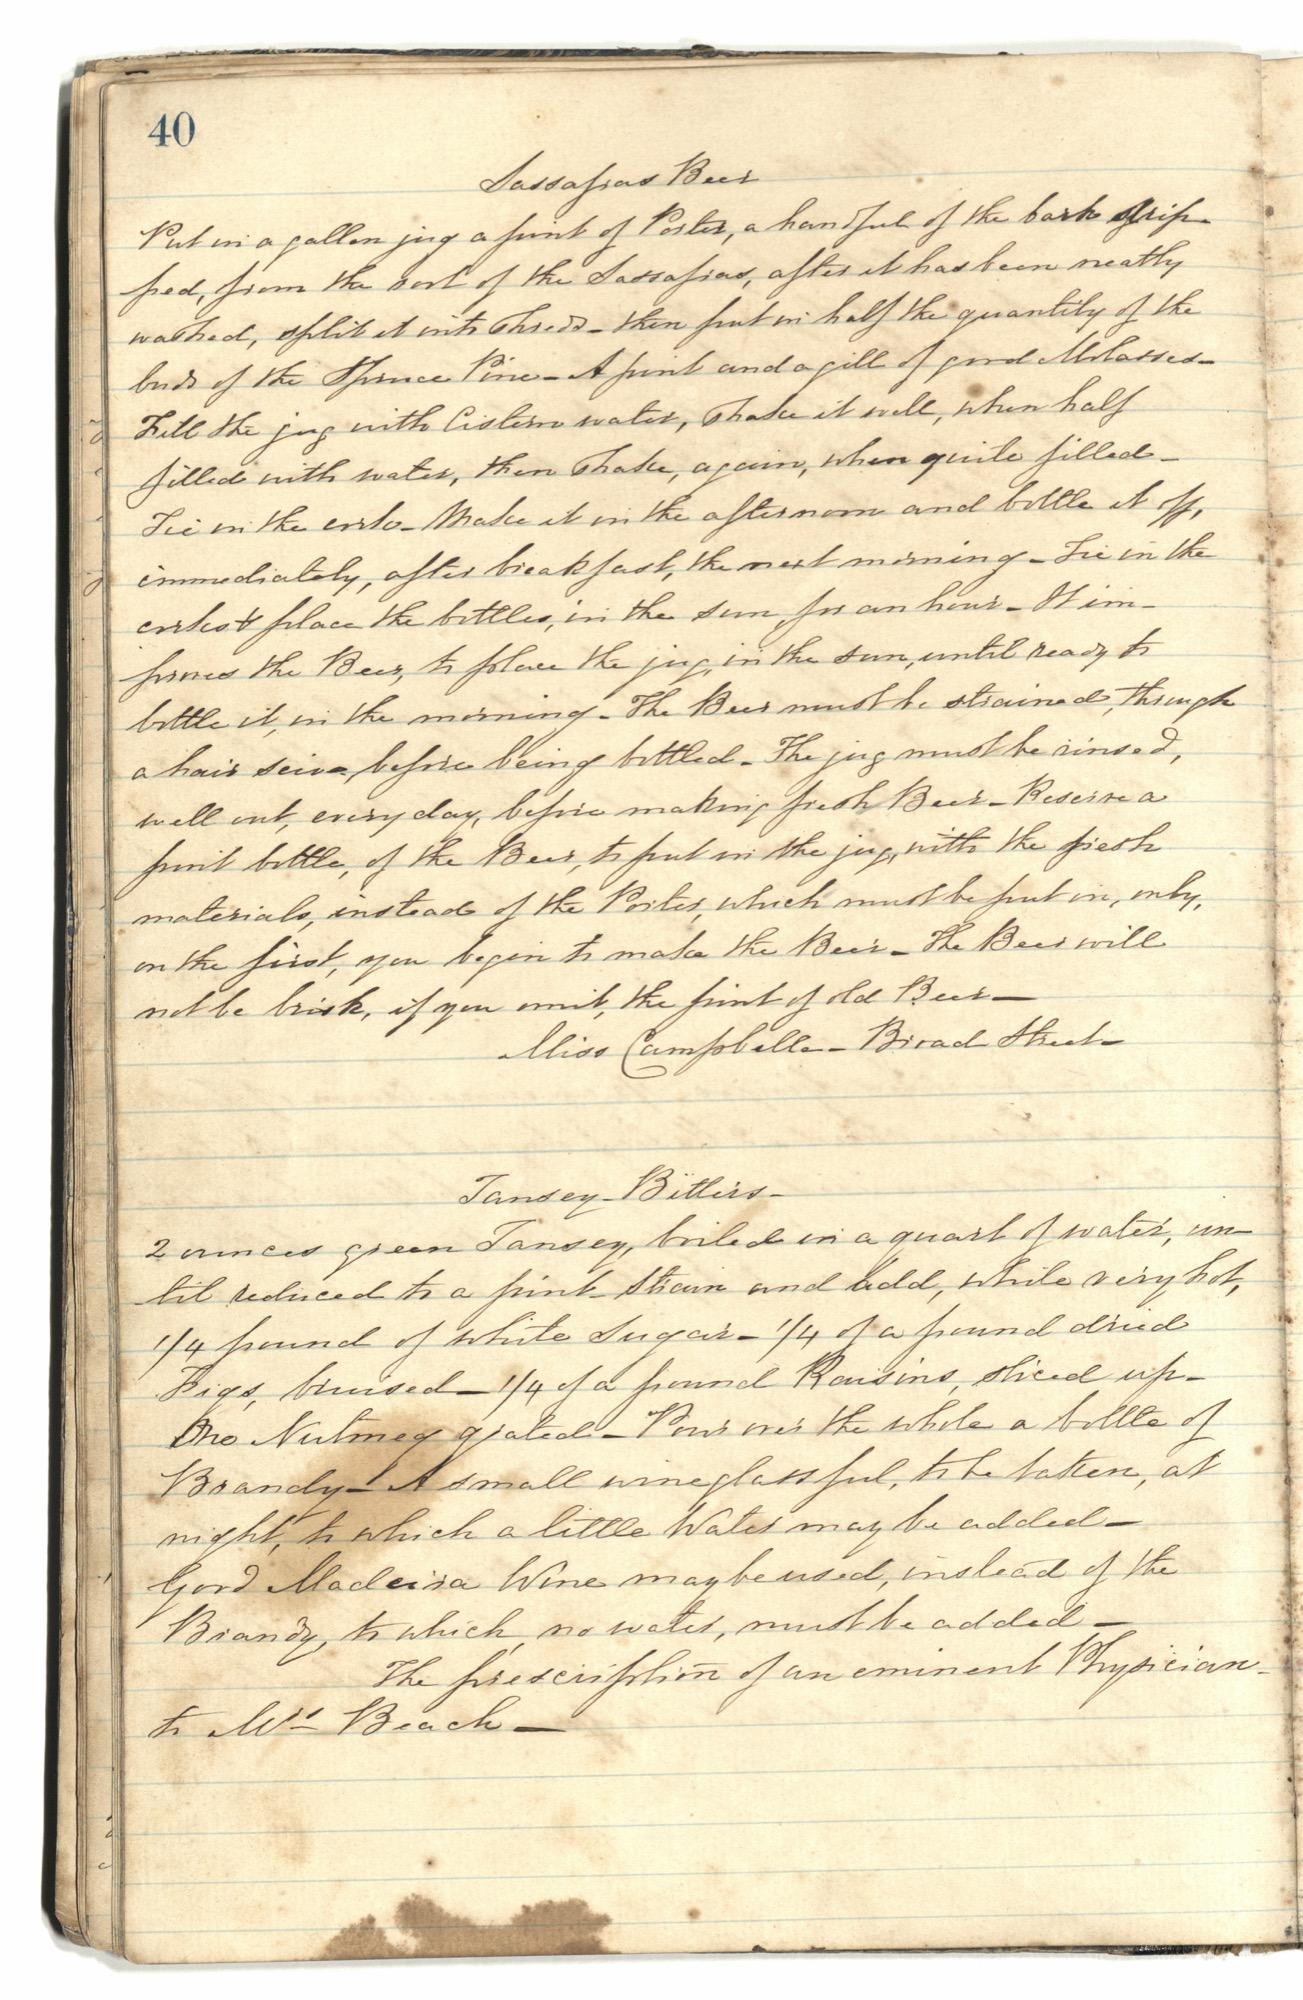 Mary Motte Alston Pringle Receipt Book, Page 44